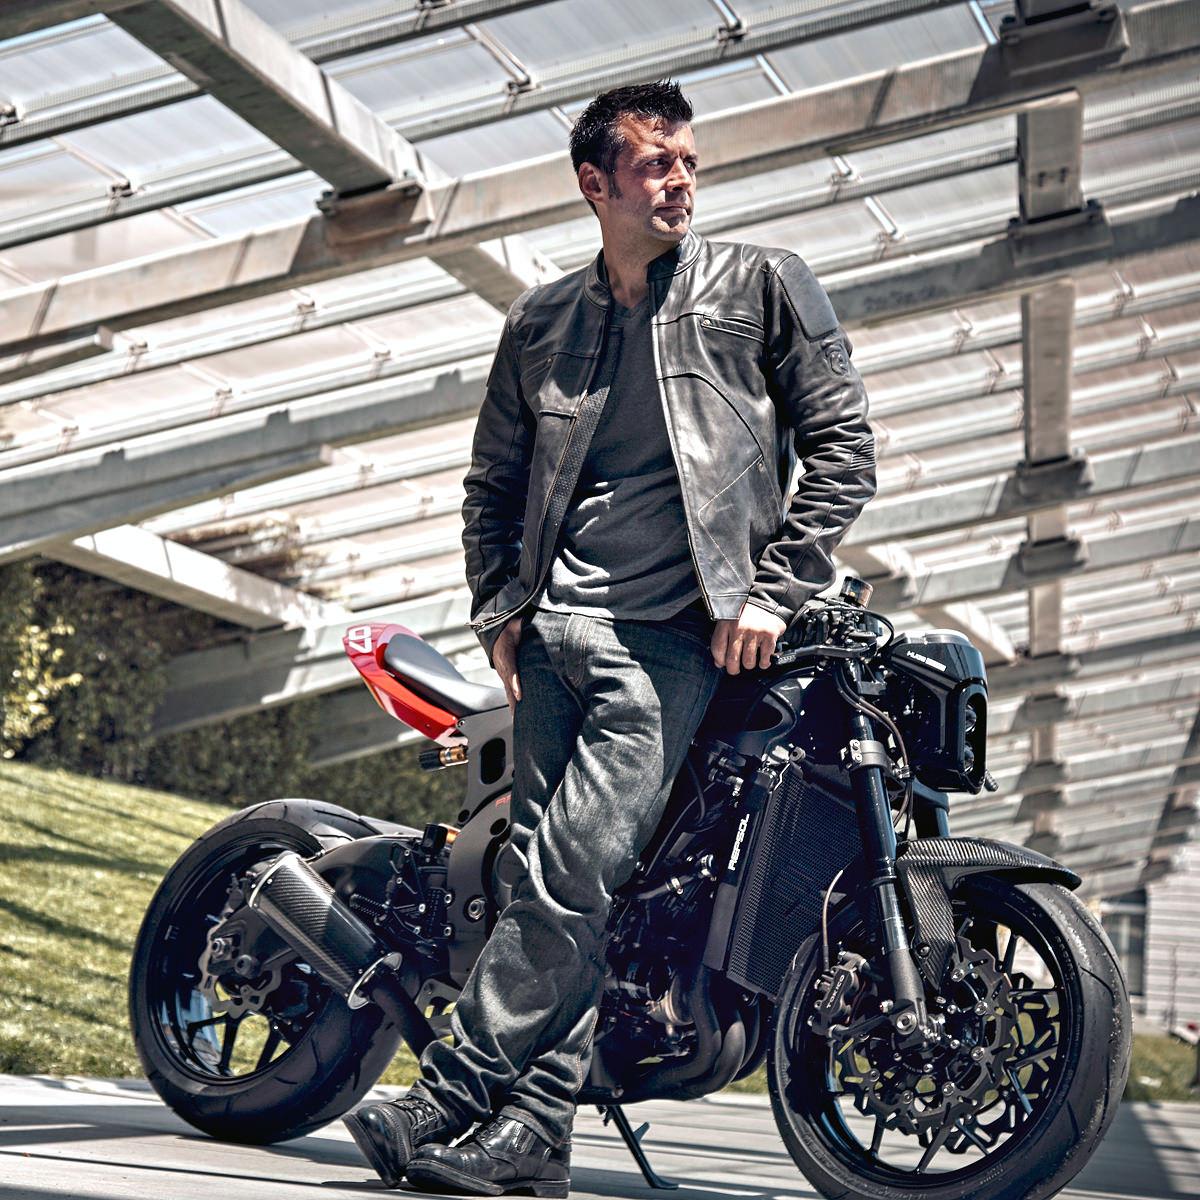 Huge Moto Custom Motorcycle Kit Rocketgarage Cafe